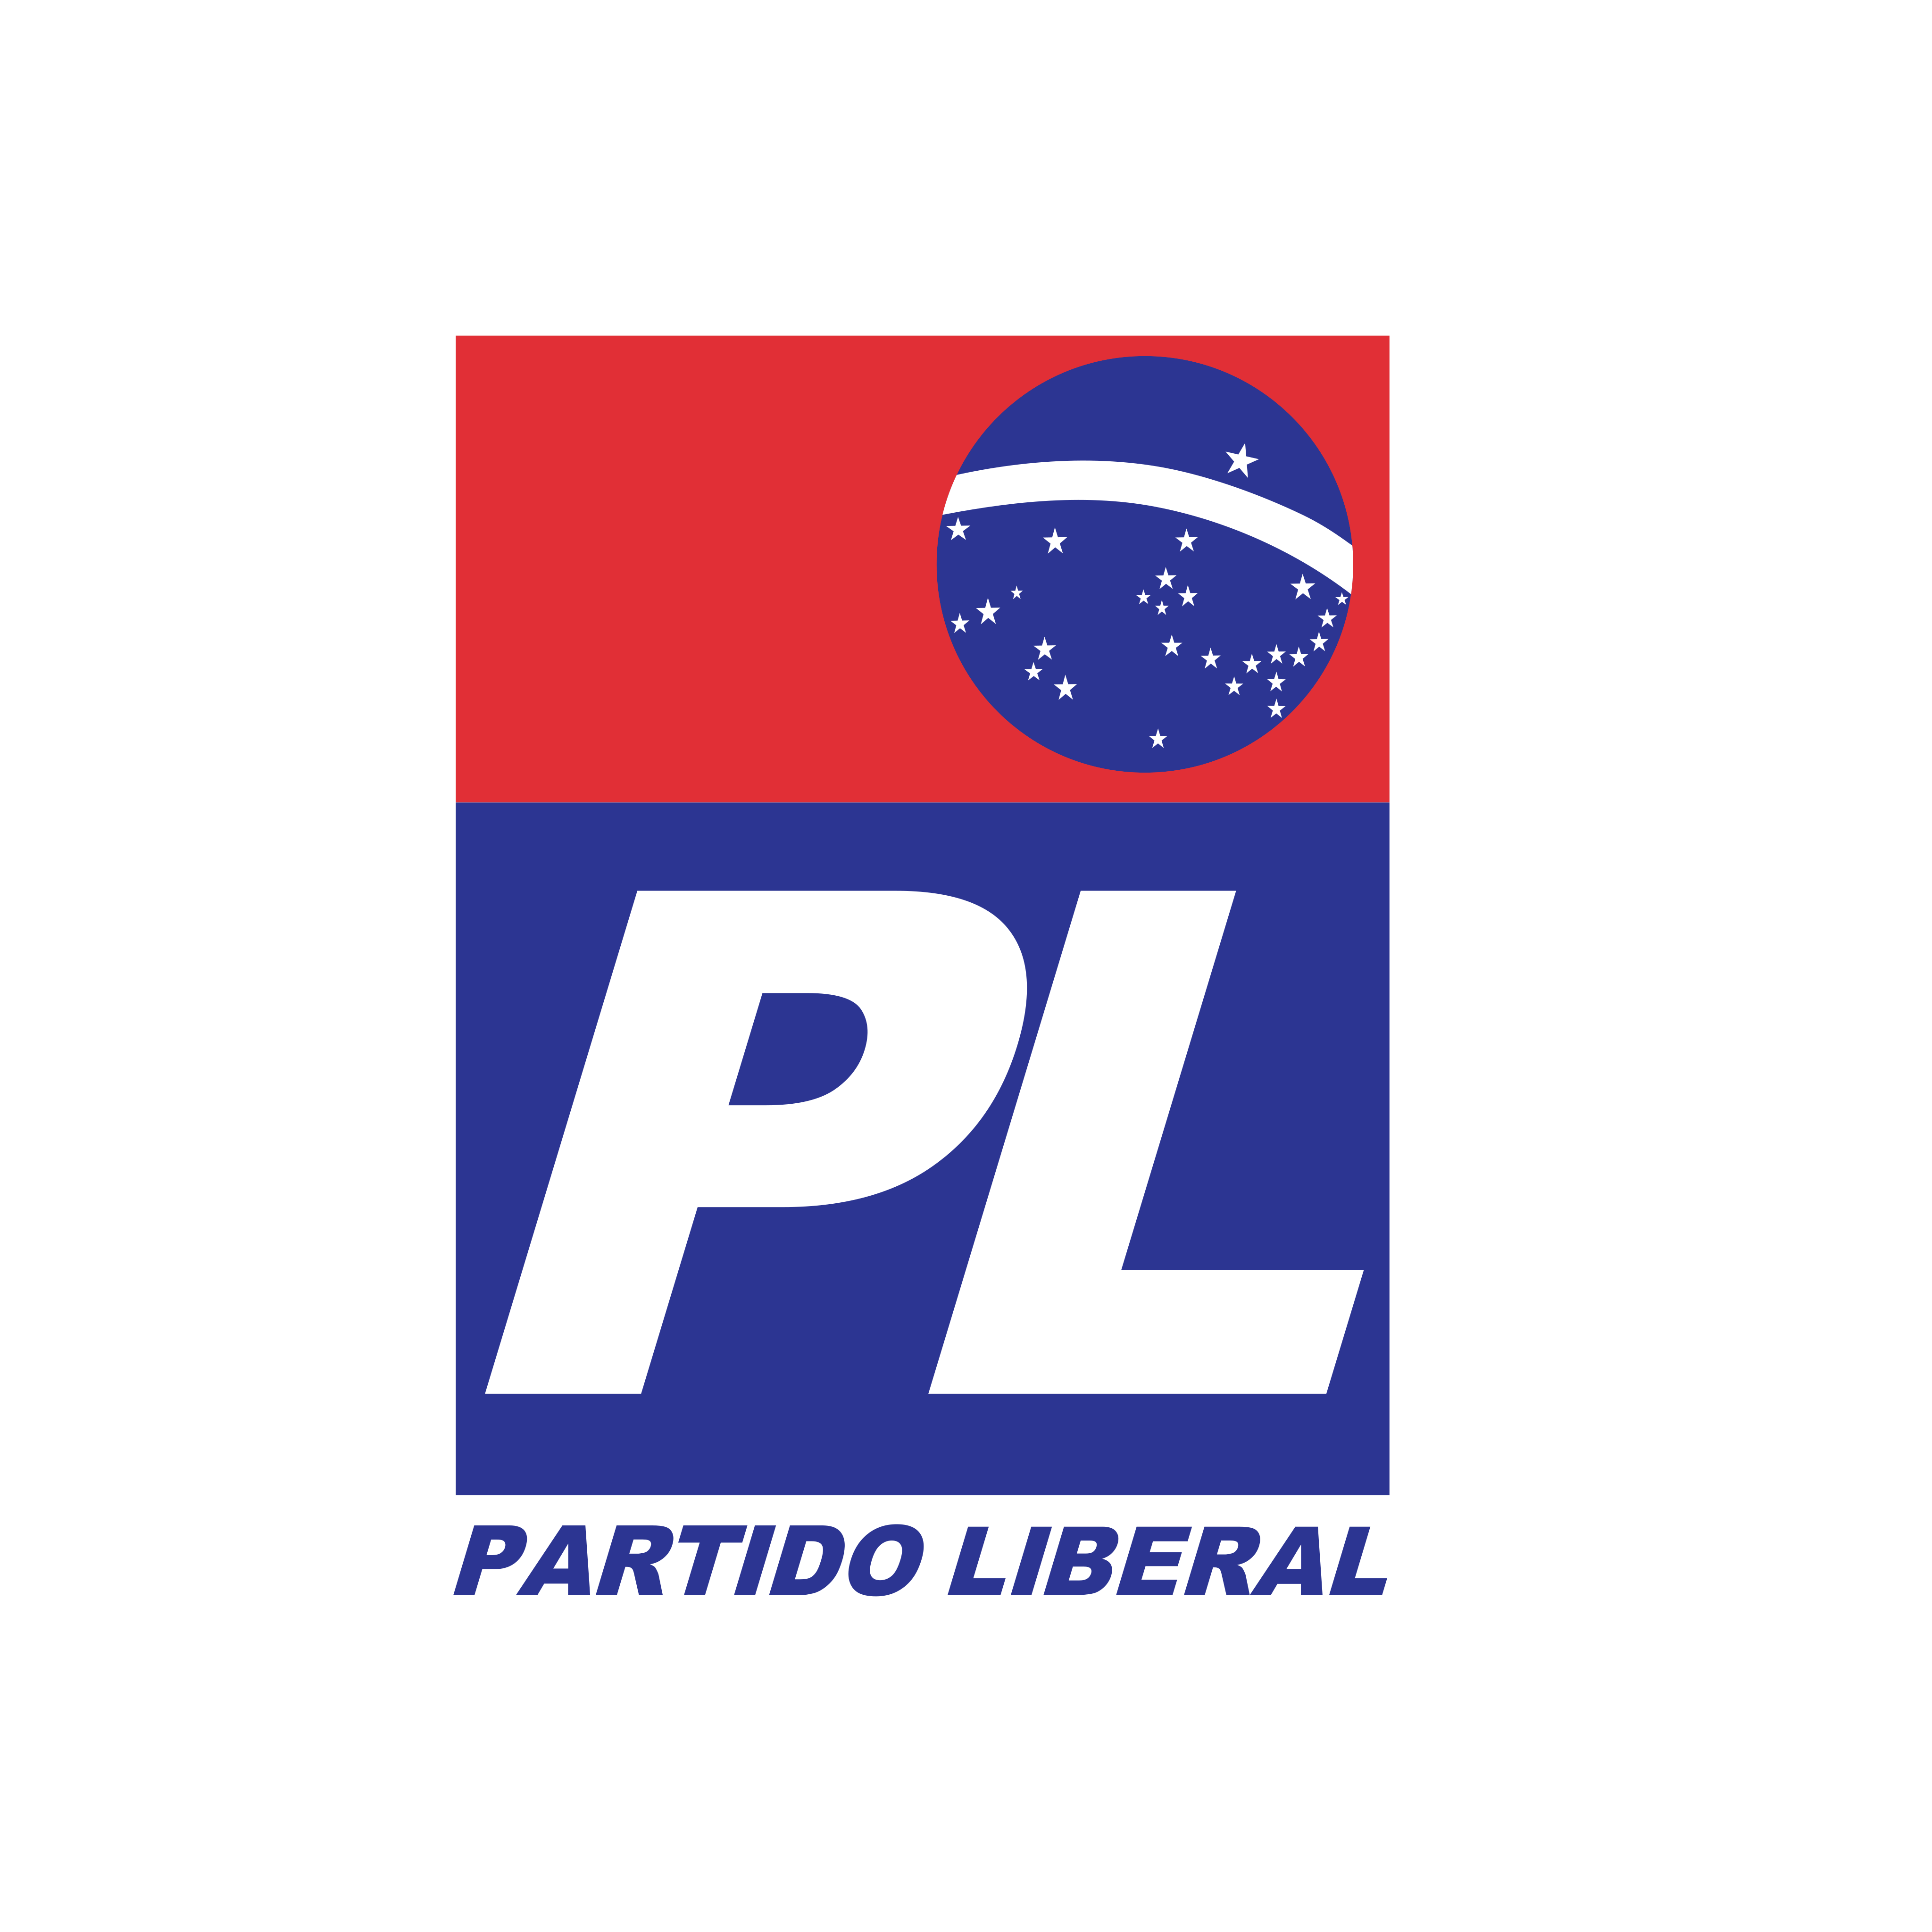 pl partido liberal logo 0 - PL Partido Liberal Logo